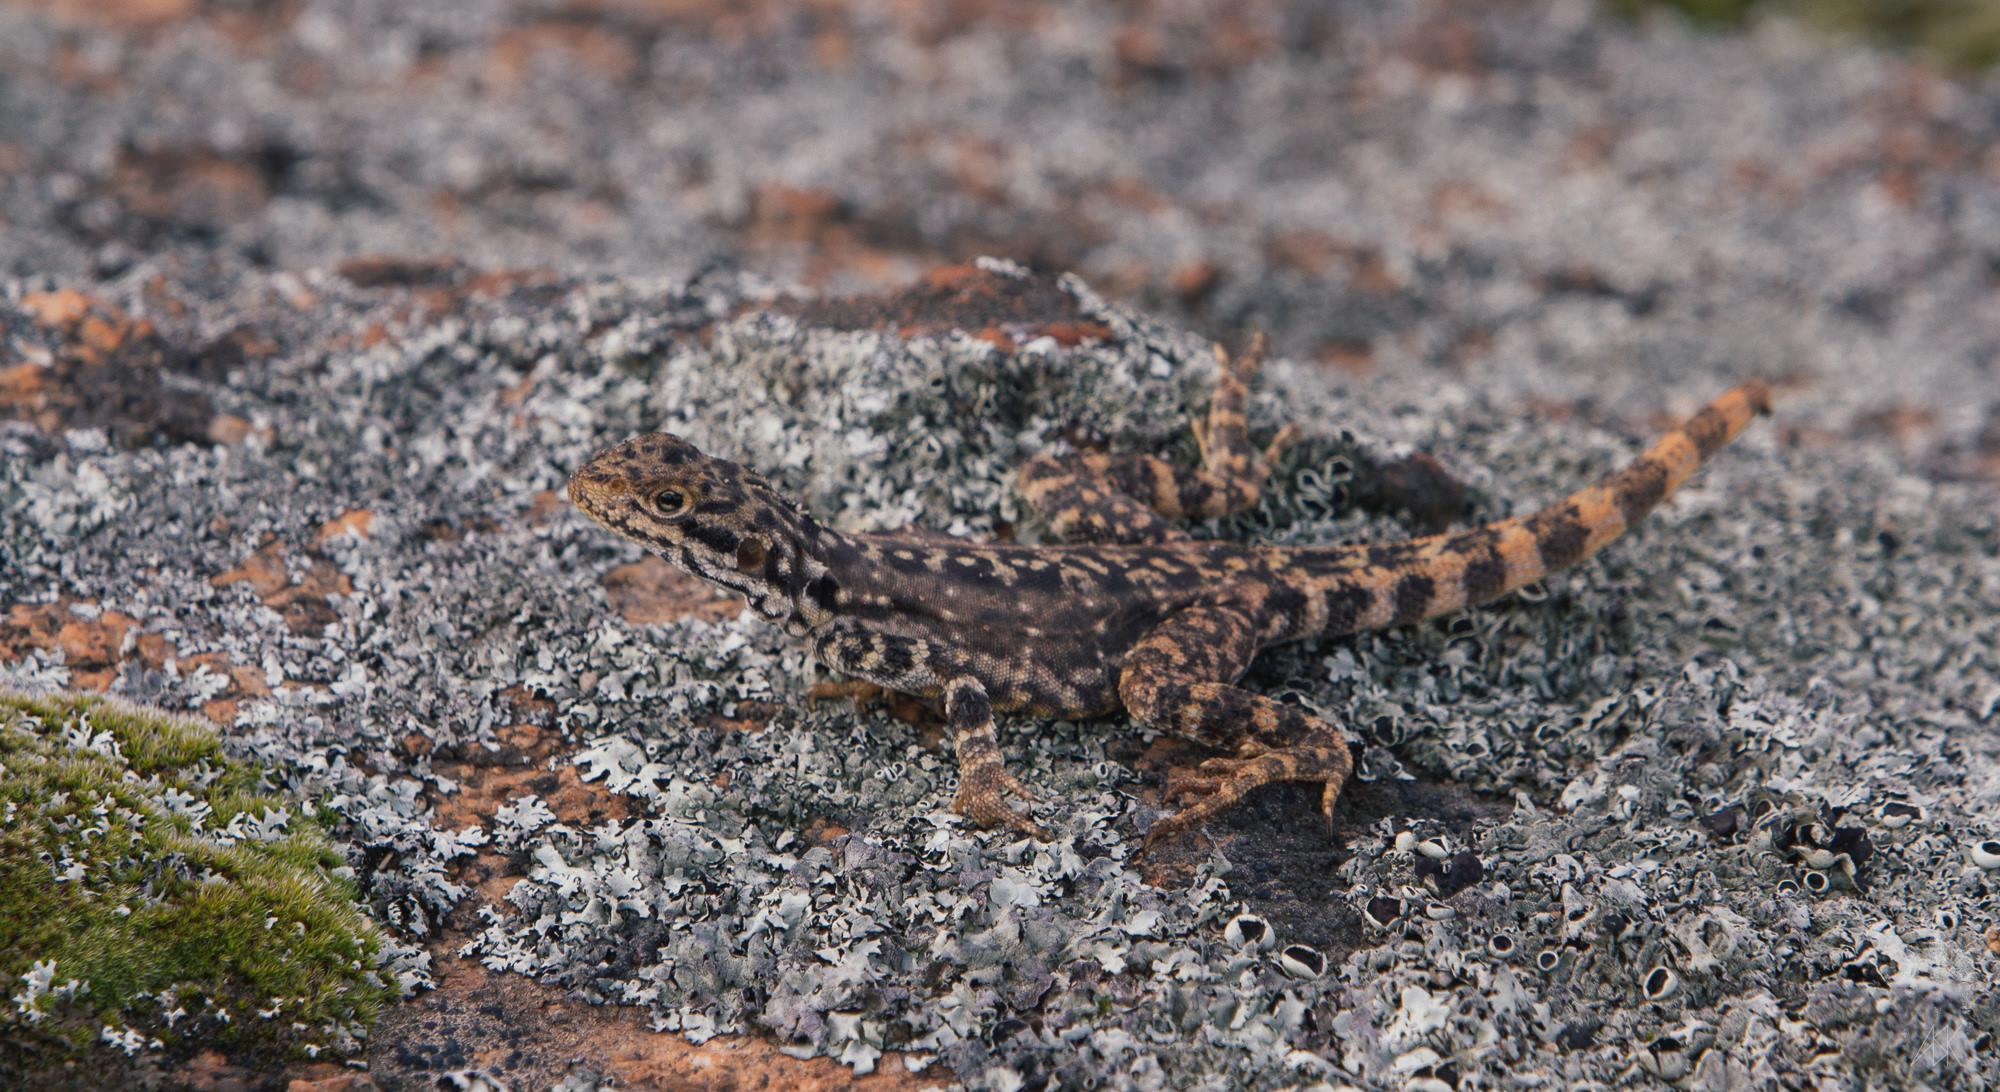 Female Ornate Dragon ( Ctenophorus ornatus ). Varley, Western Australia, 2013. Photo by Angus Kennedy.